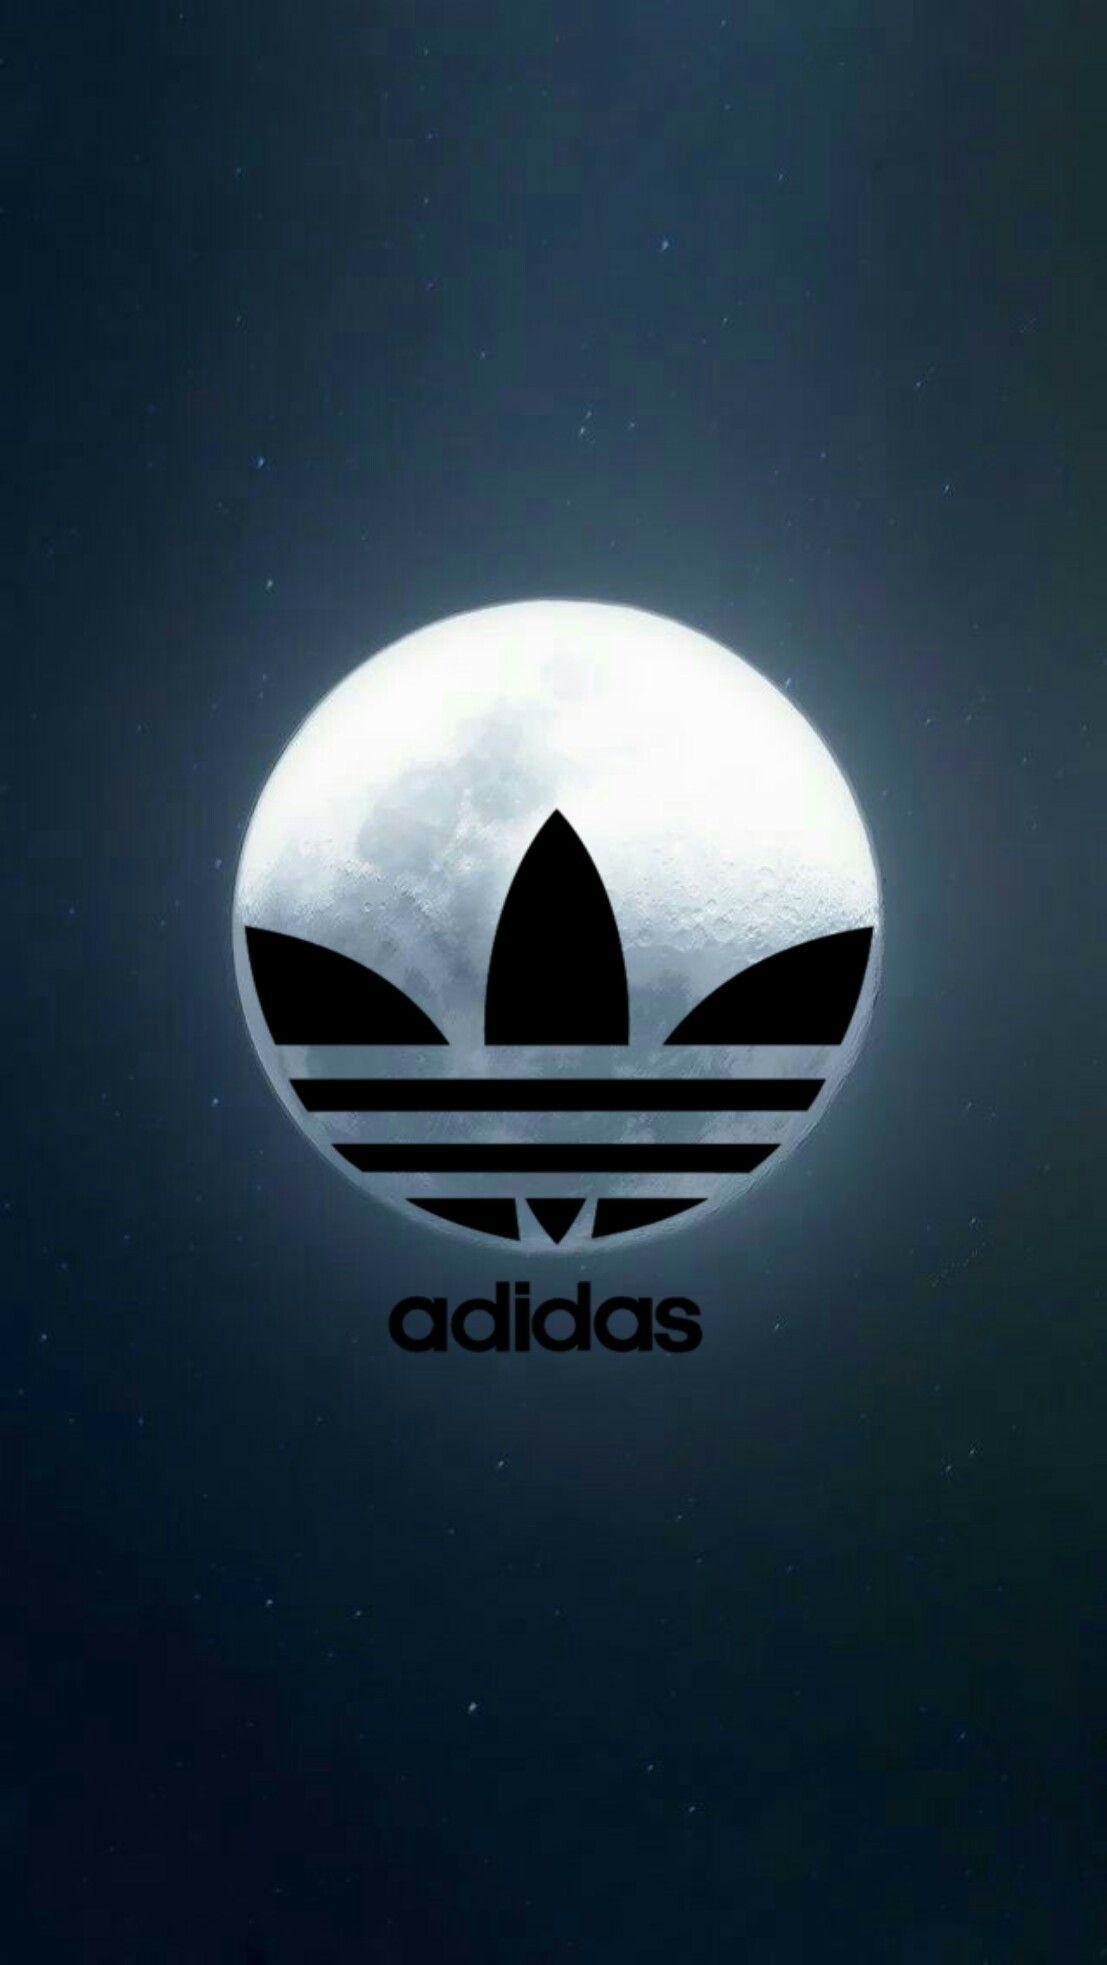 1107x1965 Adidas iPhone Wallpaper (72+ images) วอลเป